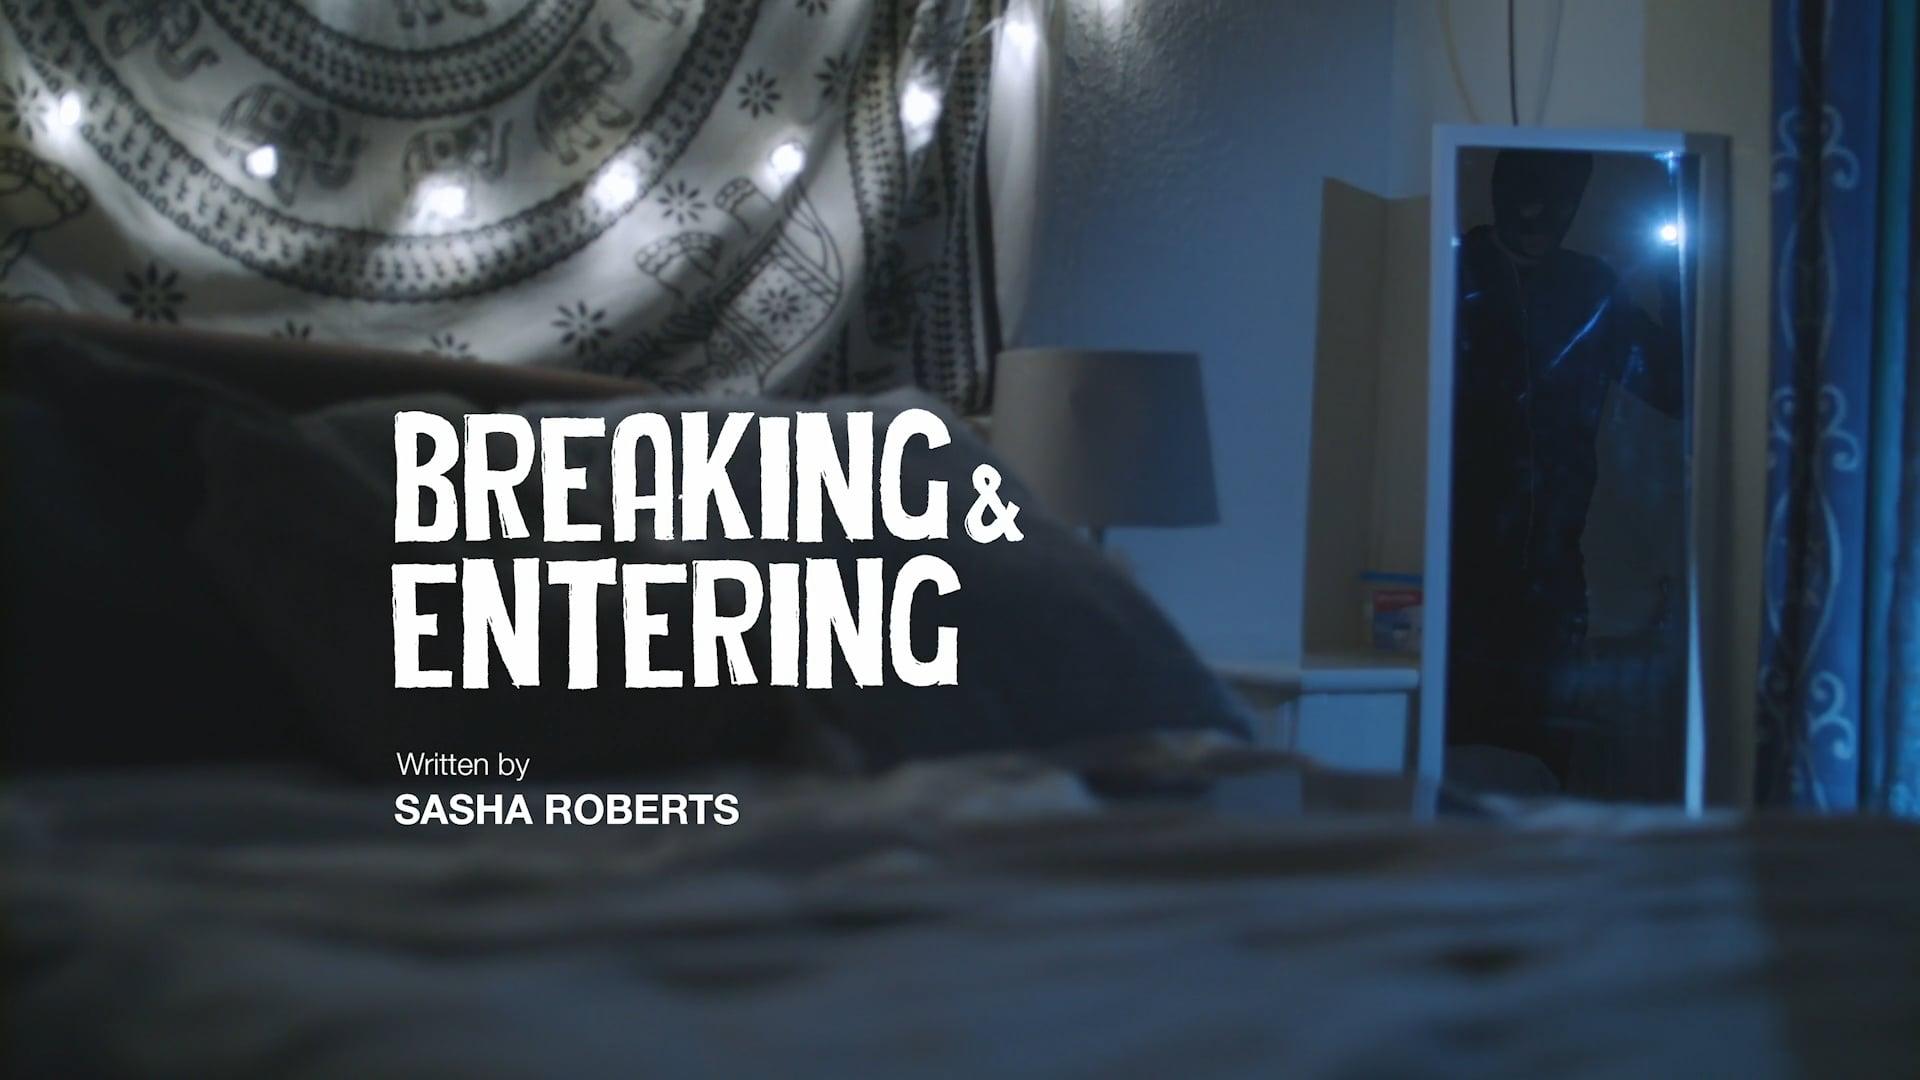 Breaking & Entering